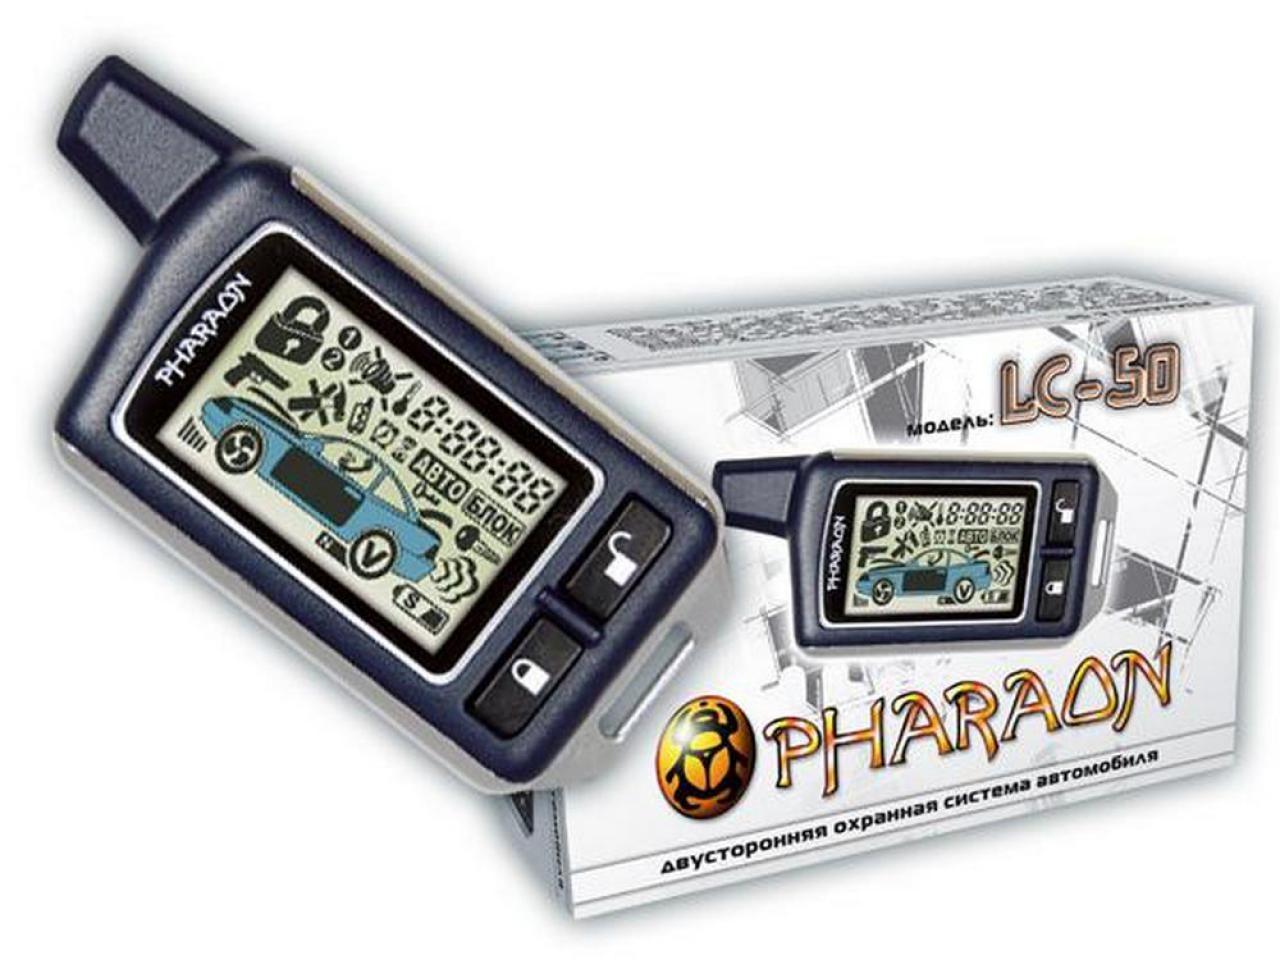 Pharaon LC 50